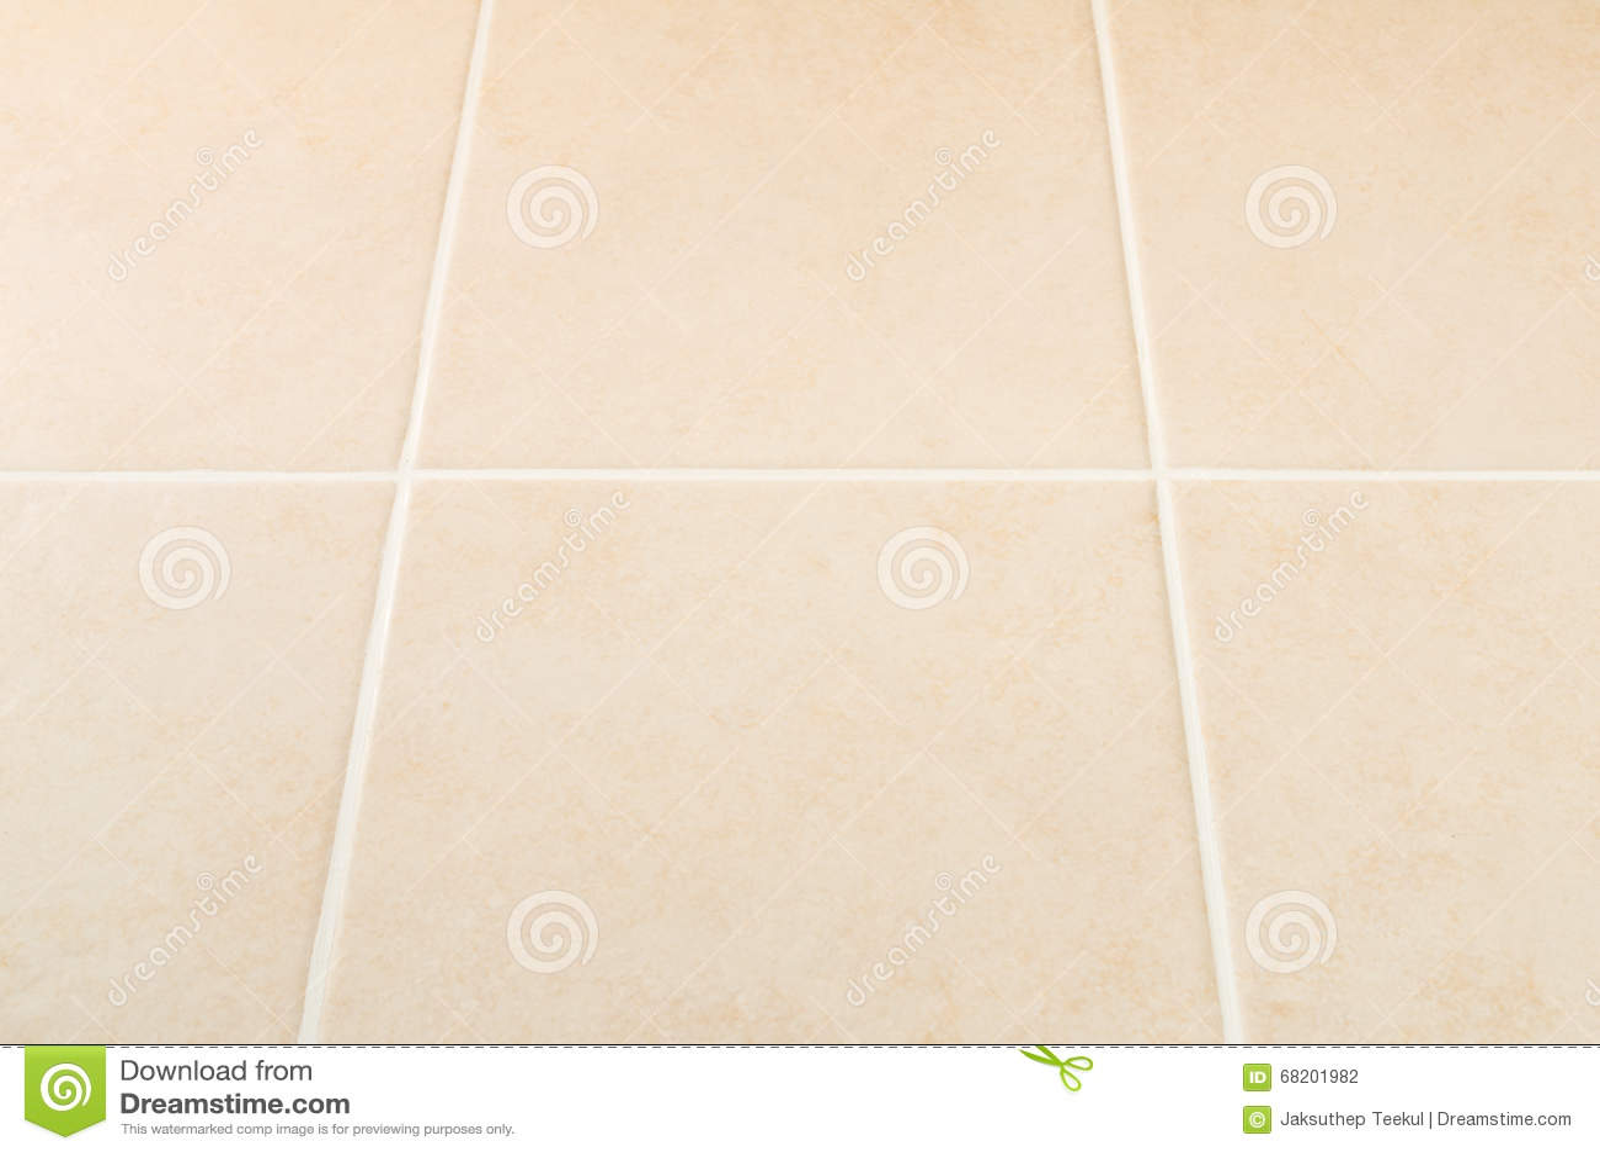 Cream tile wall stock photo. Image of floor, cream, background ...